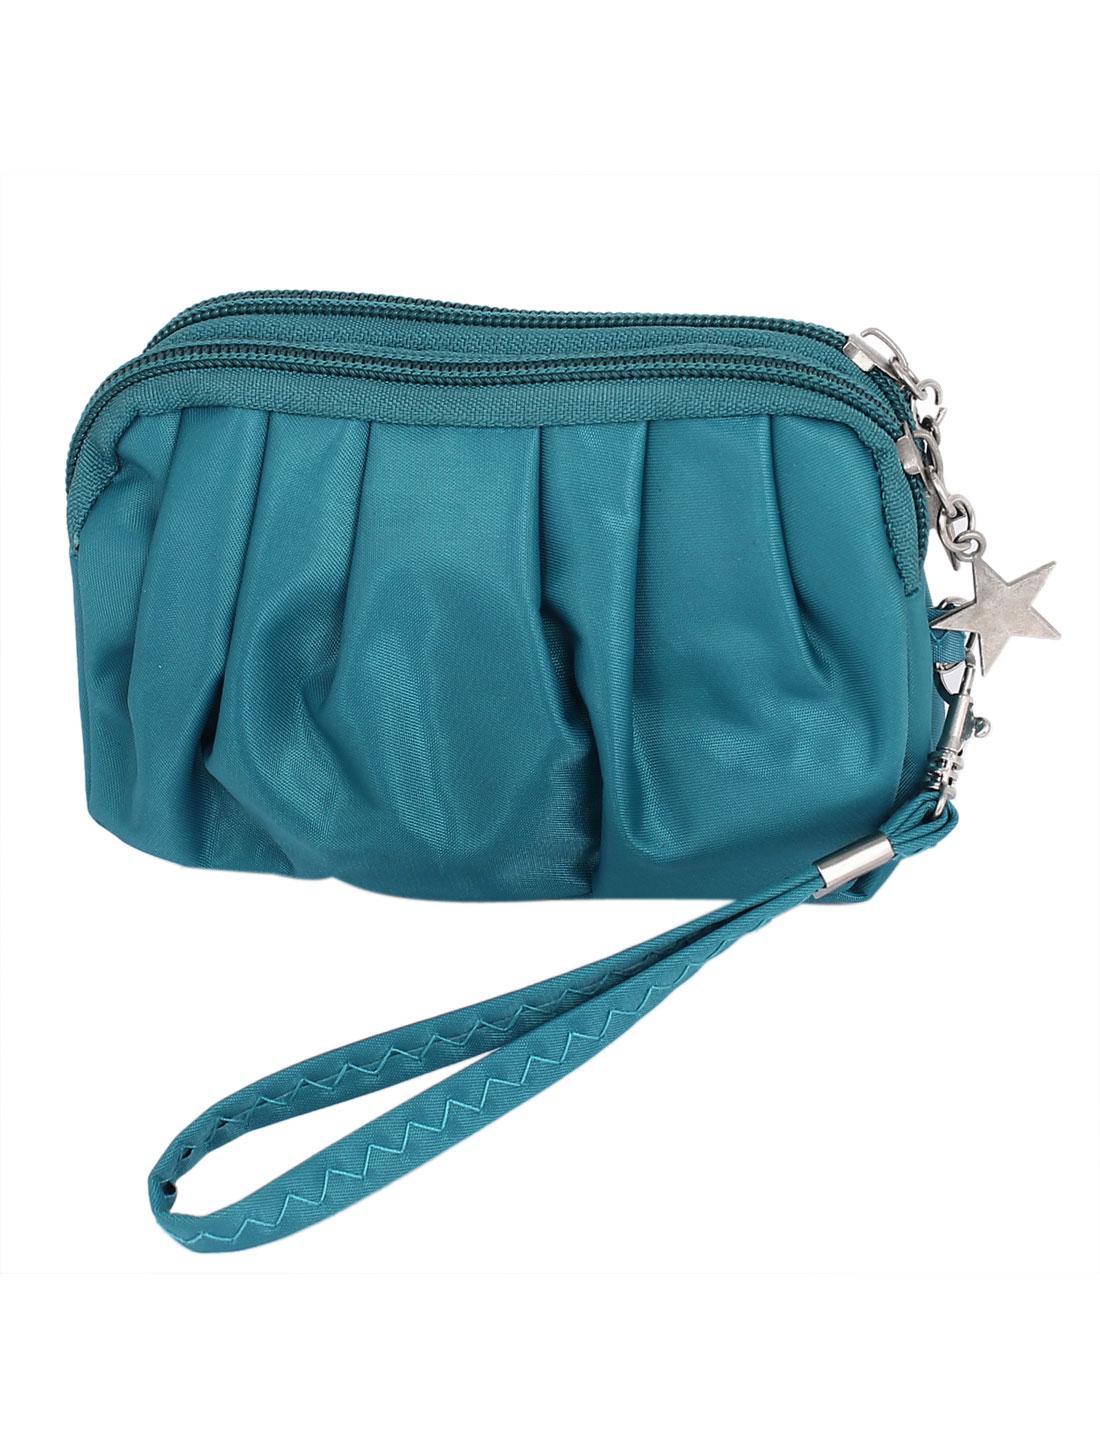 Lady Double Zipper Closure Handhold Cellphone Coin Wallet Purse Royal Blue